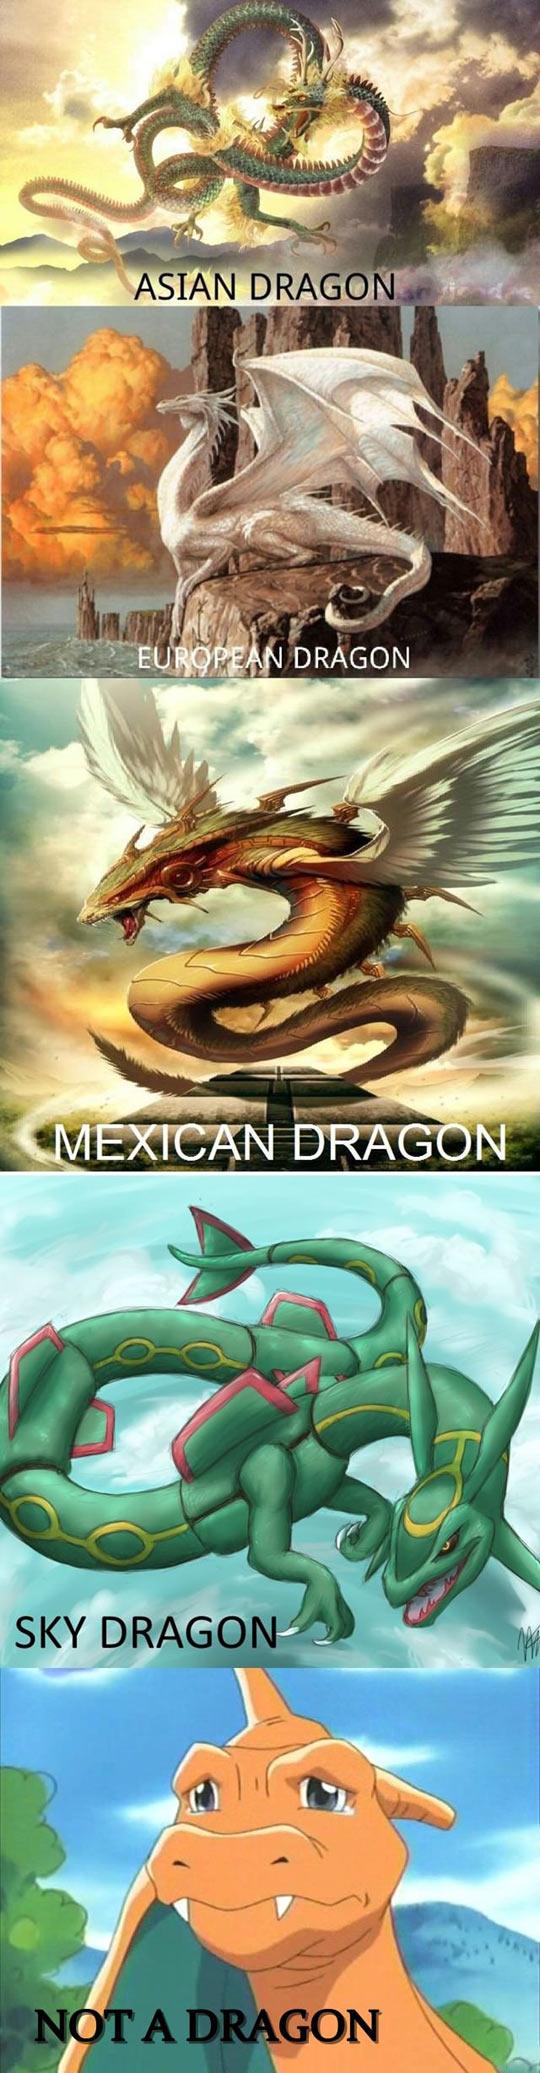 Dragon Debate Solved